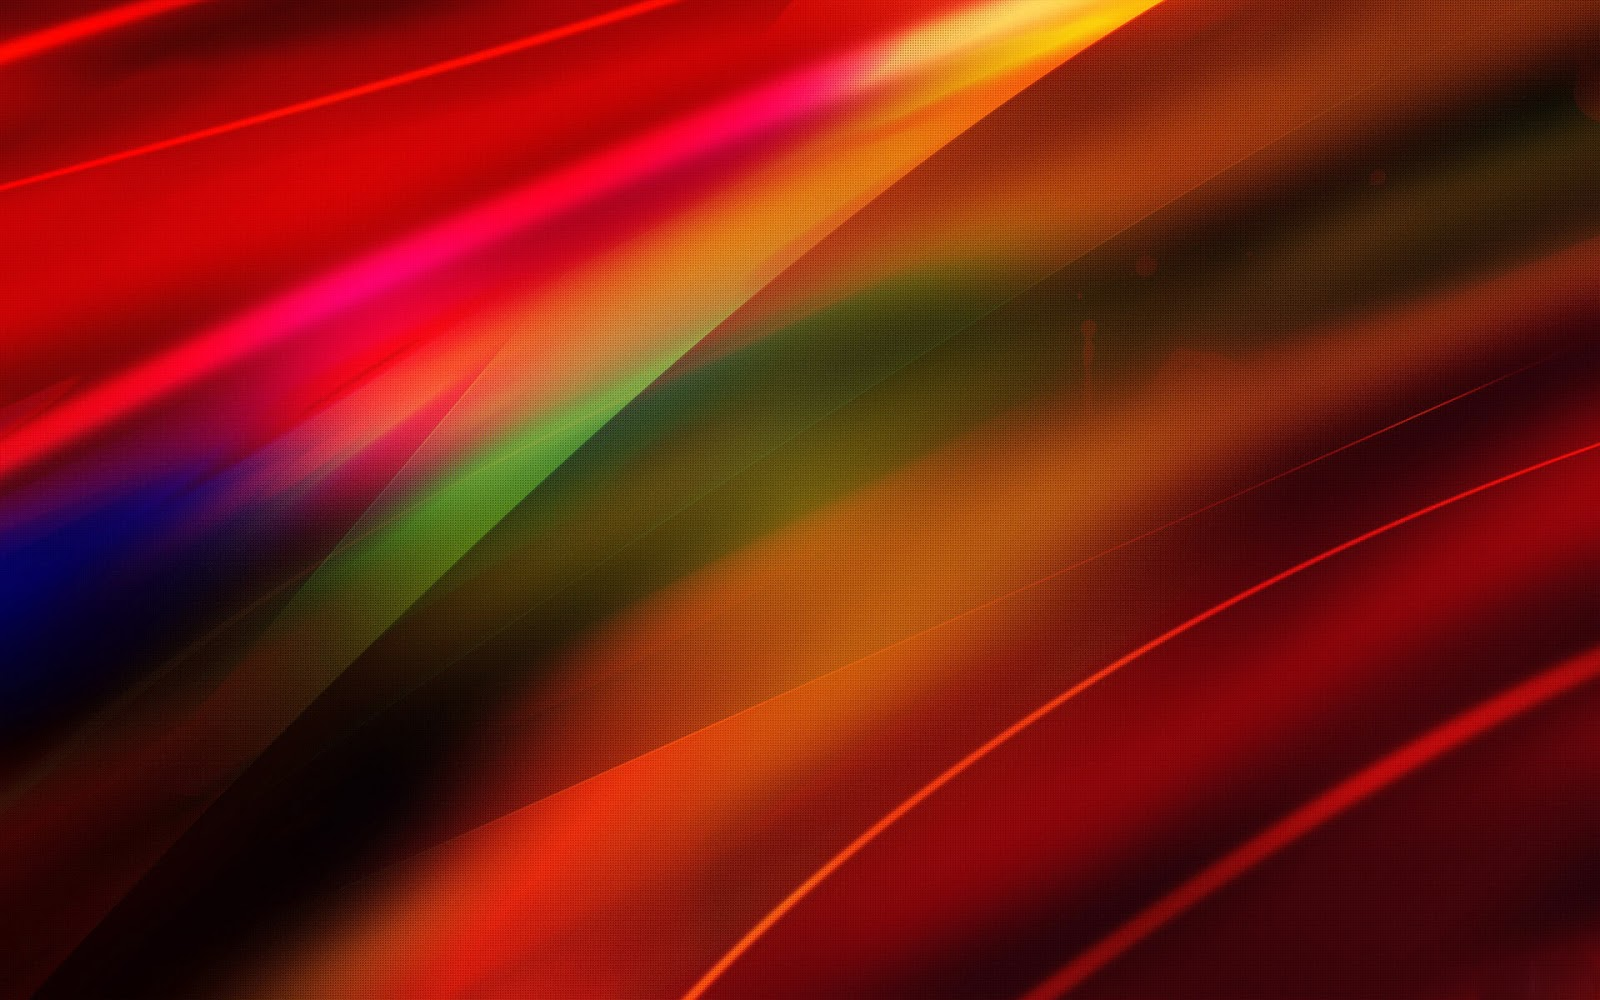 Color Combination Full Hd Desktop Wallpapers 1080p